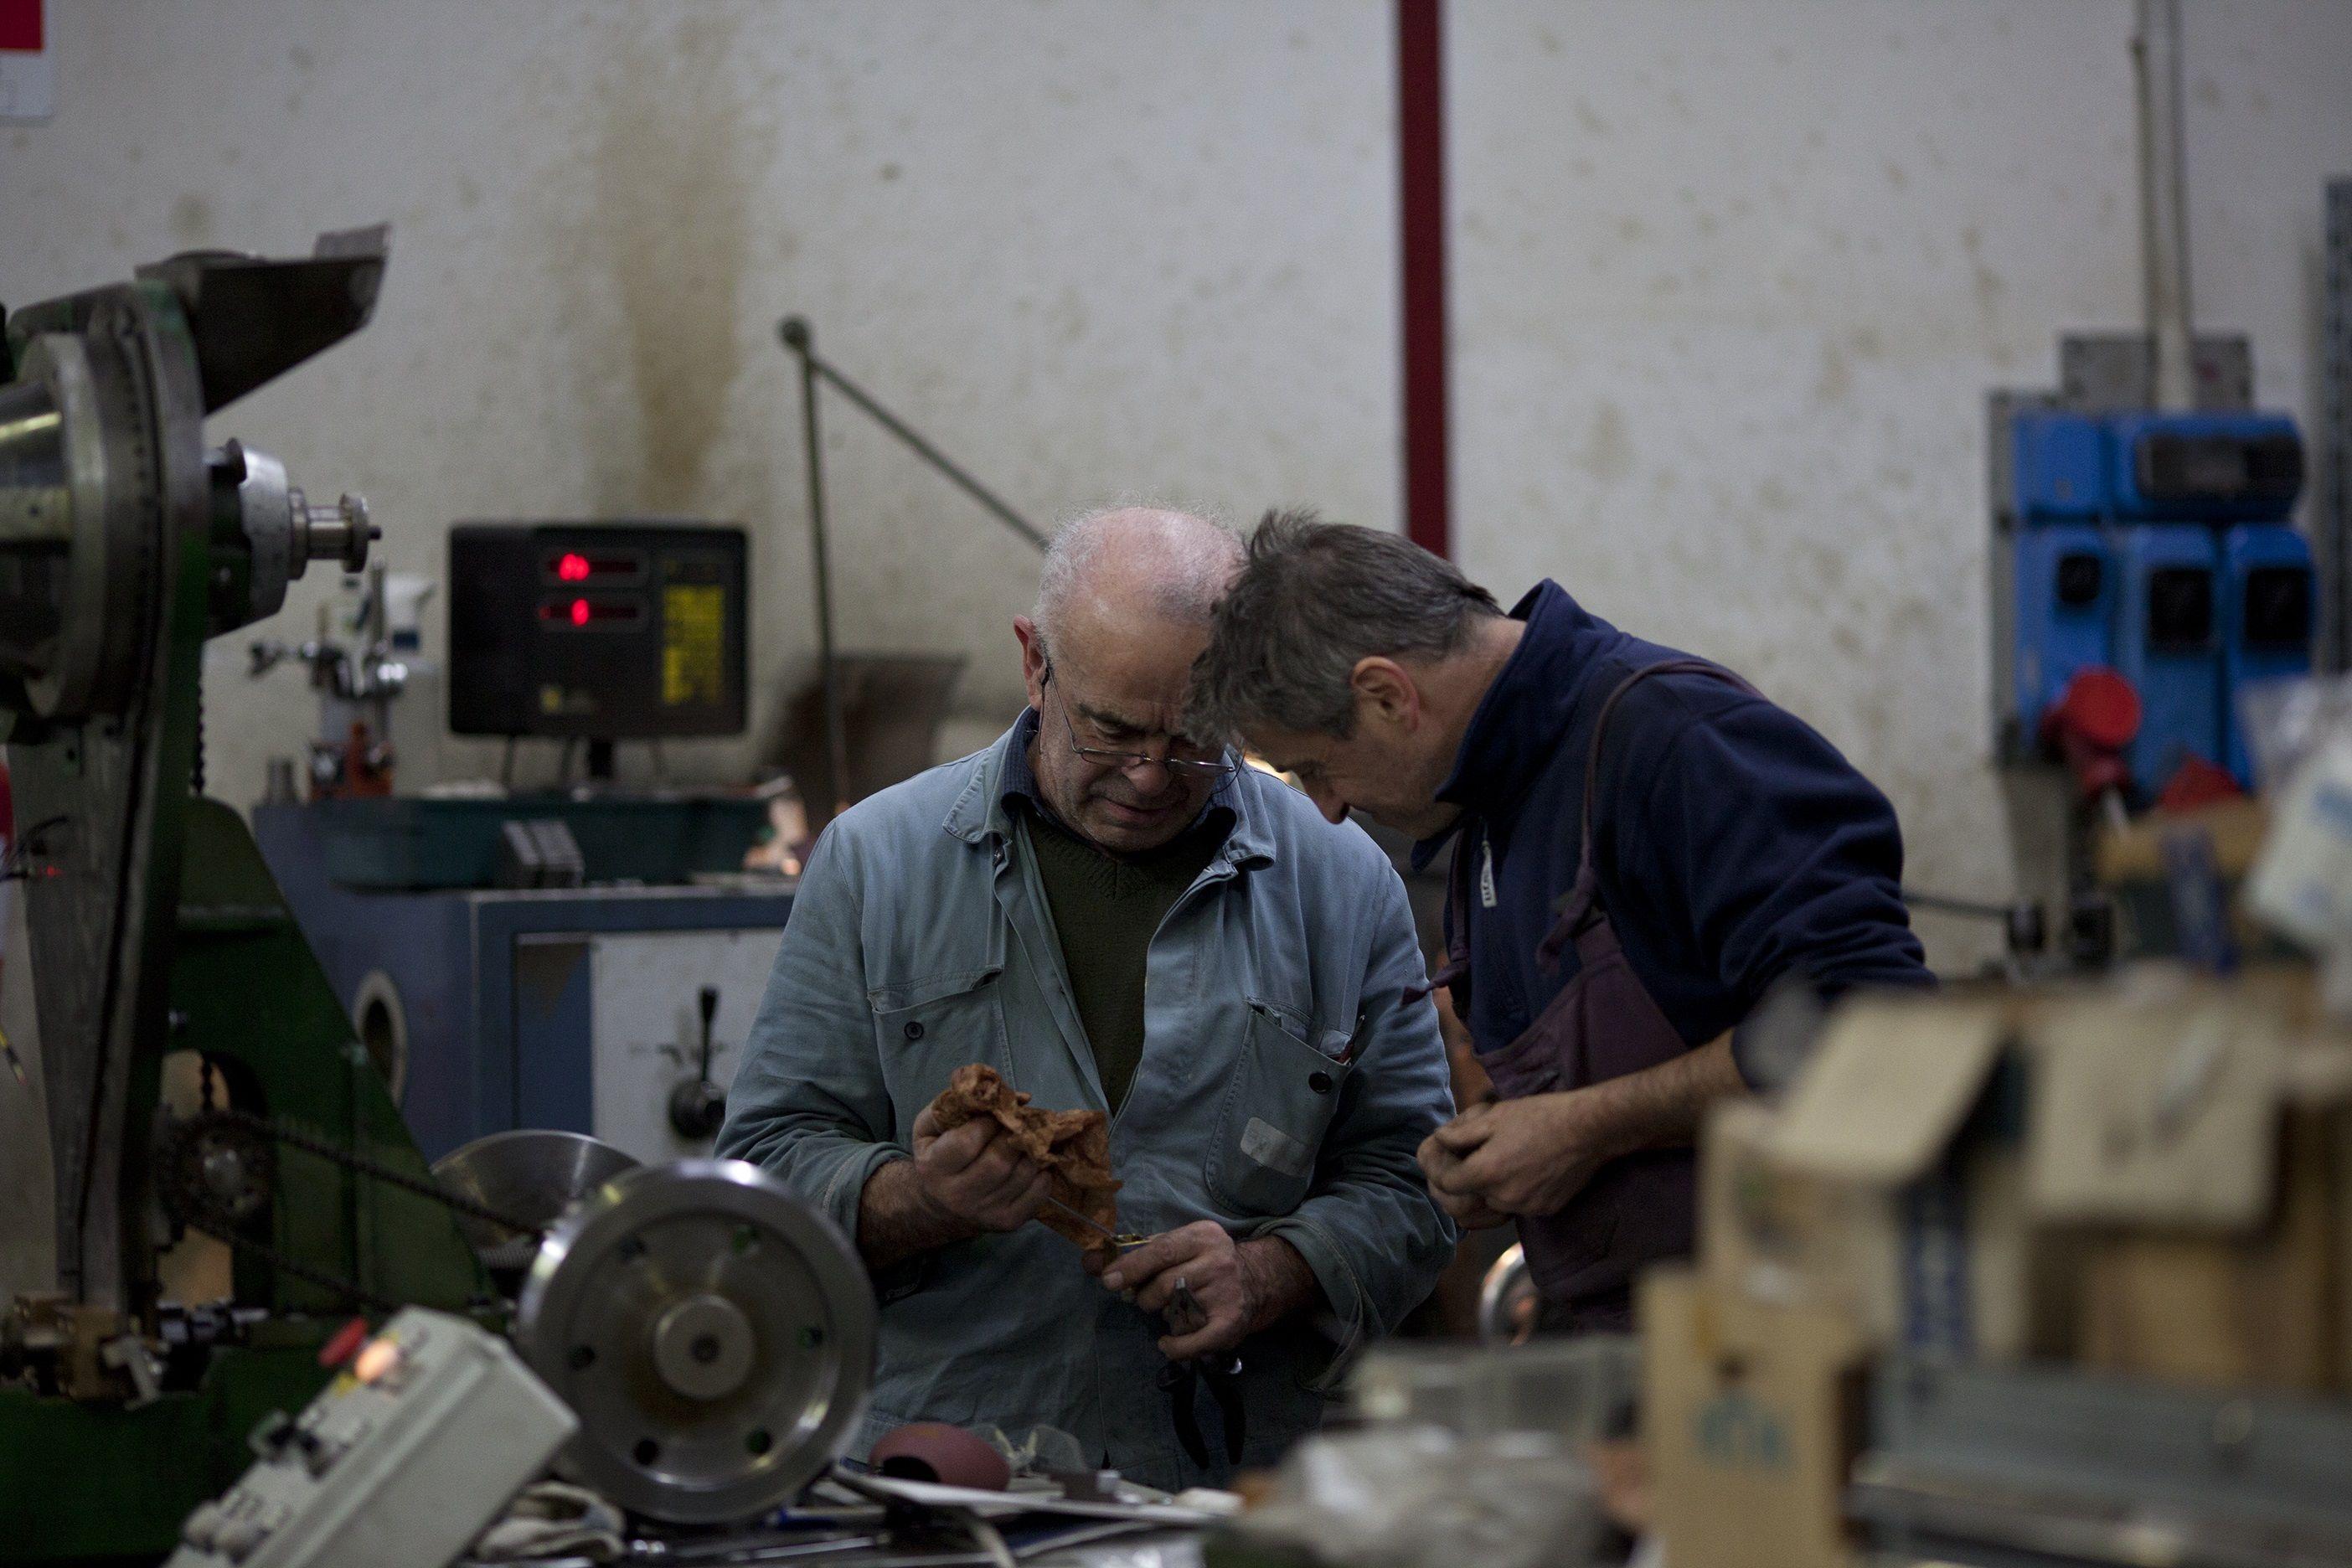 Passione e competenza - Passion and expertise